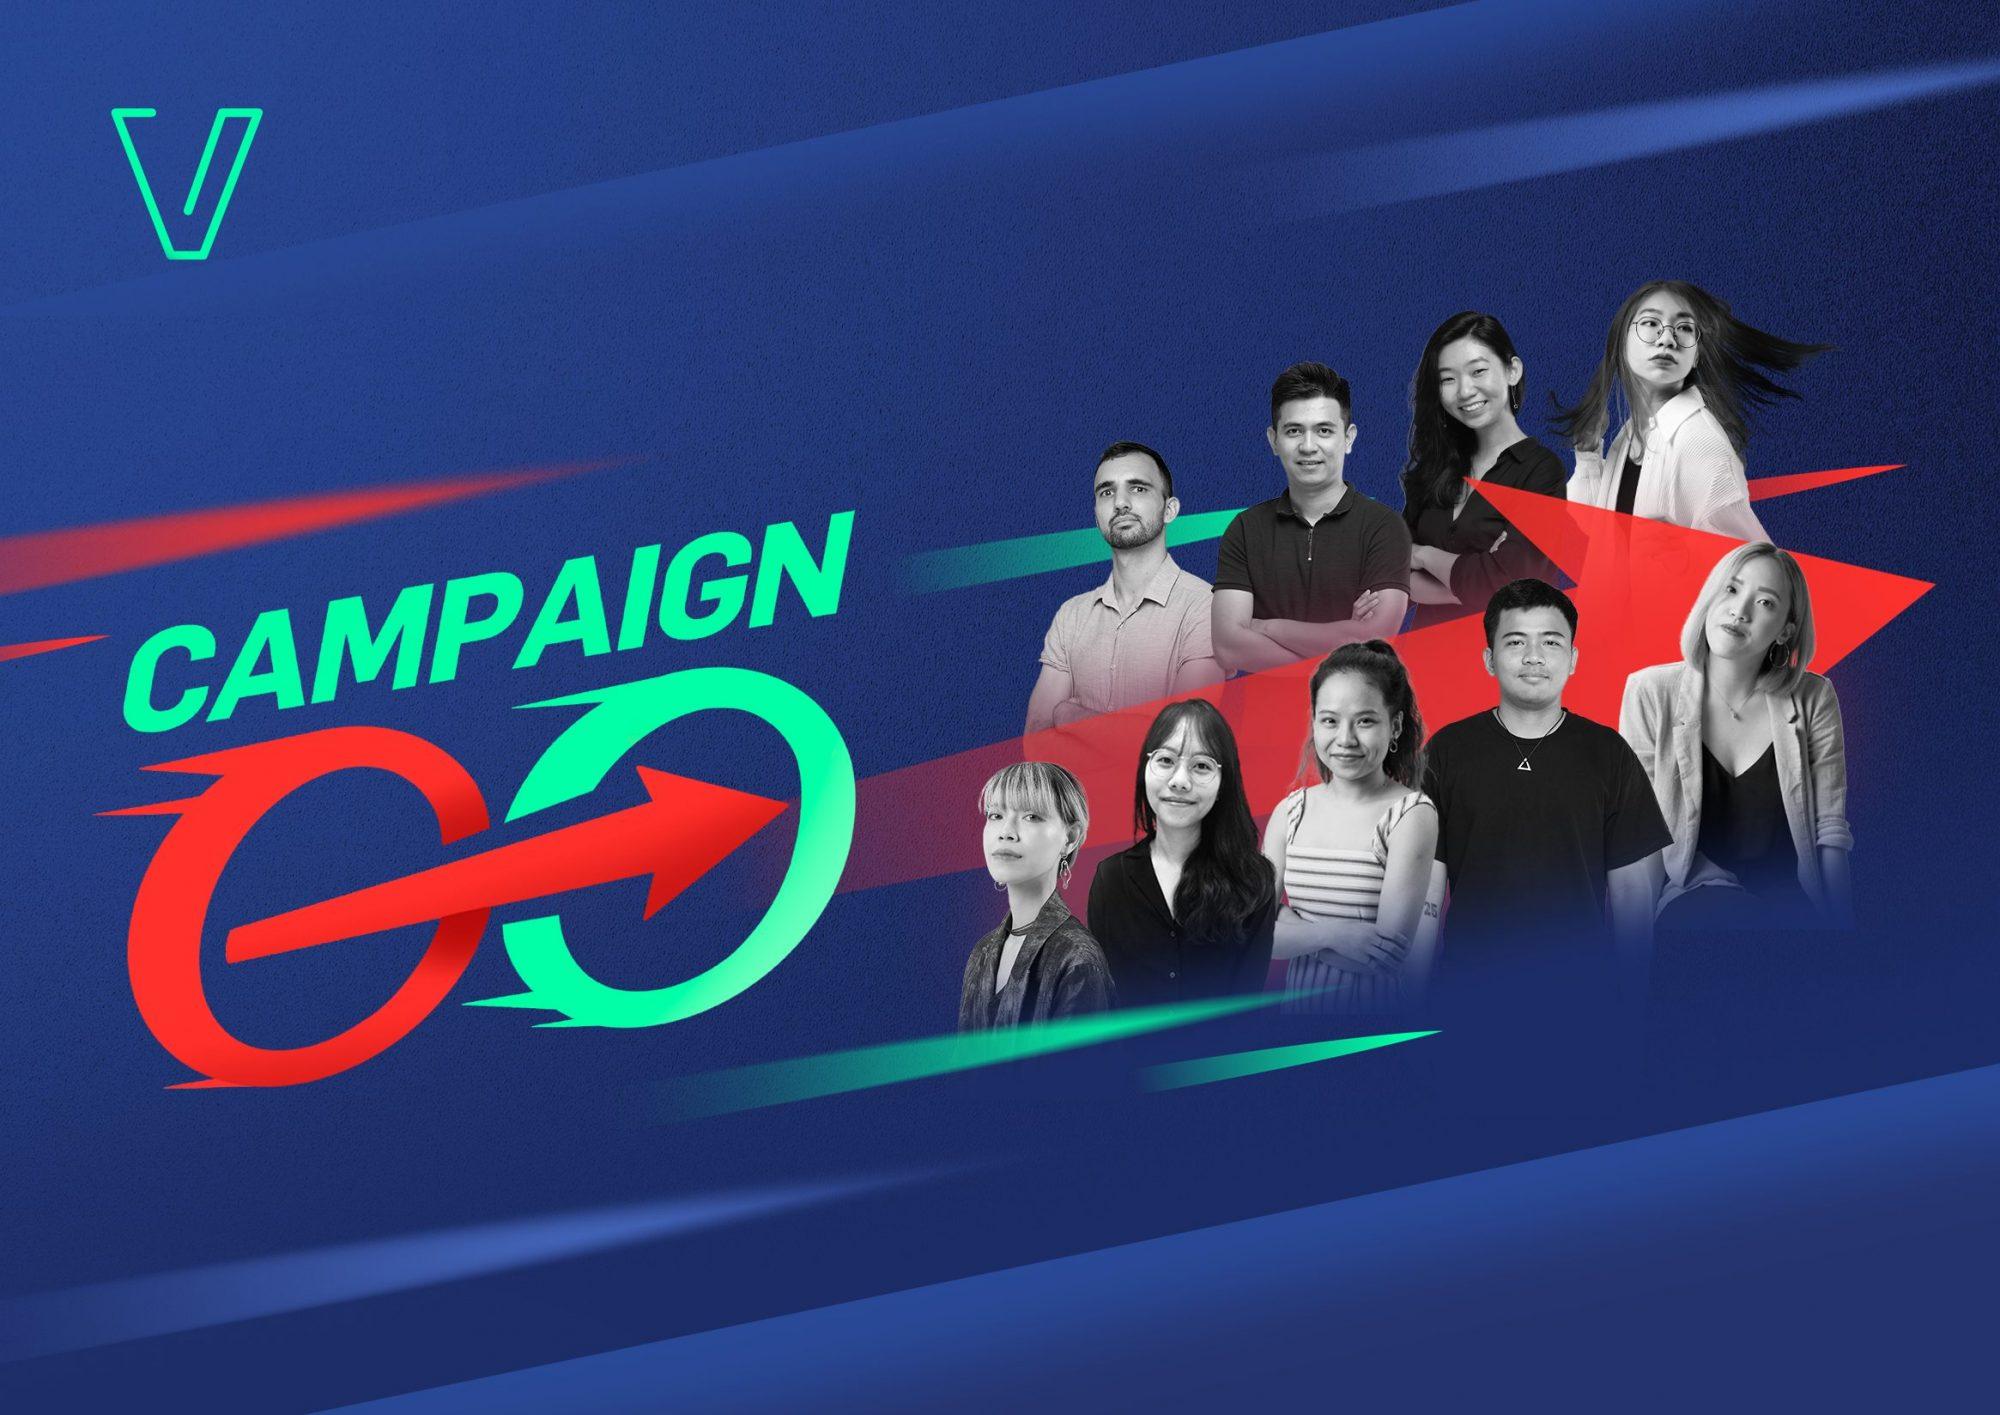 Meet the team behind Campaign Go